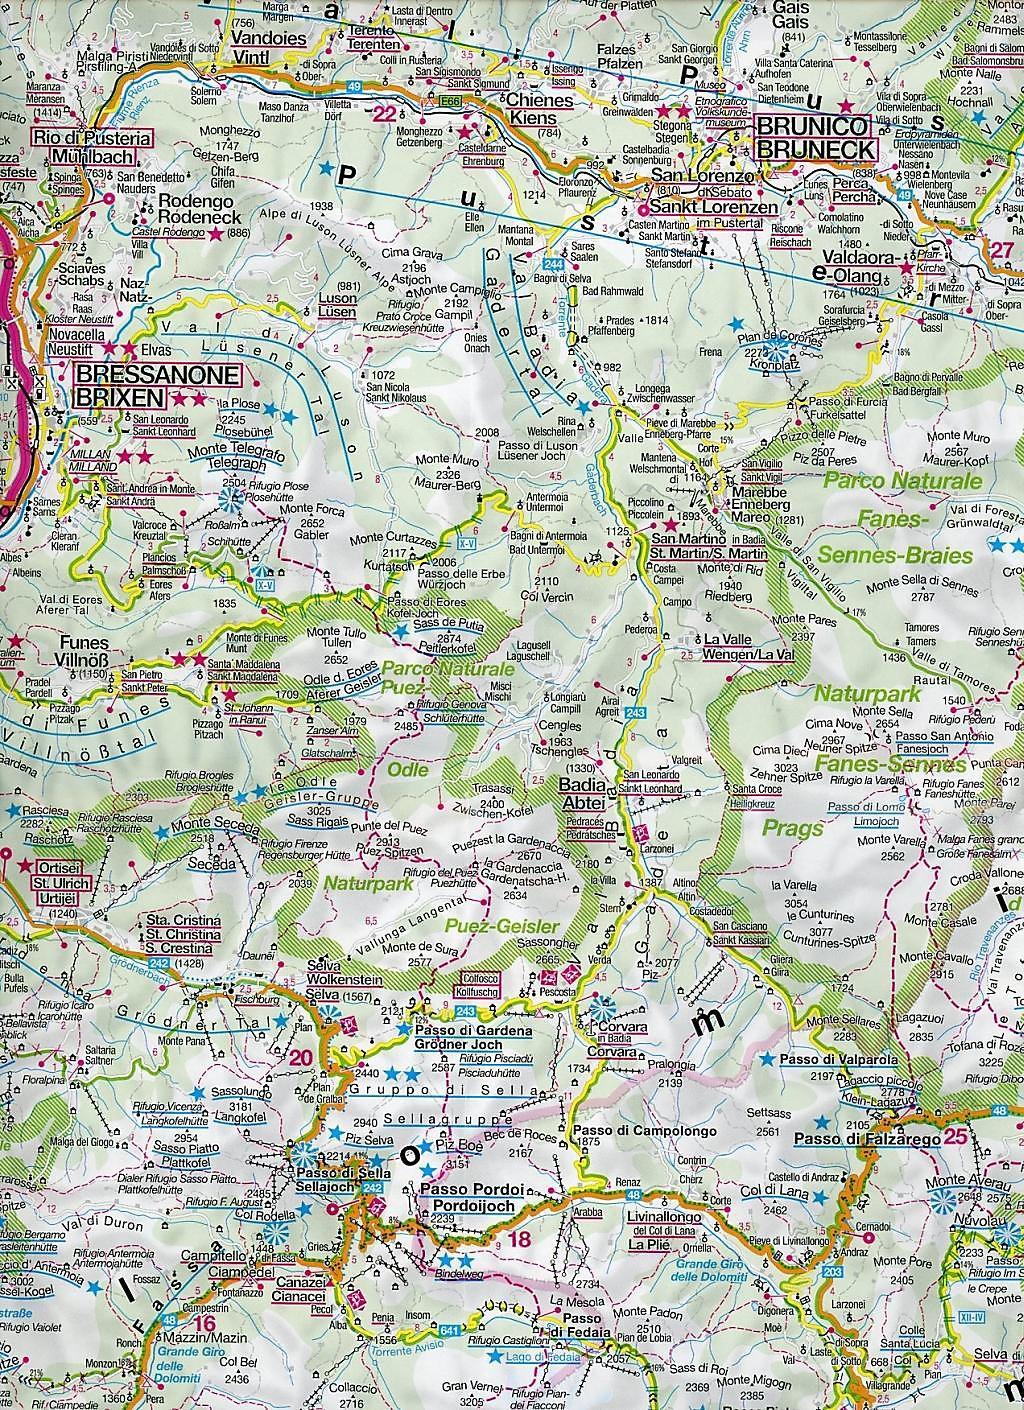 dolomiten karte Kompass Karte Dolomiten Dolomiti Dolomites Buch   Weltbild.de